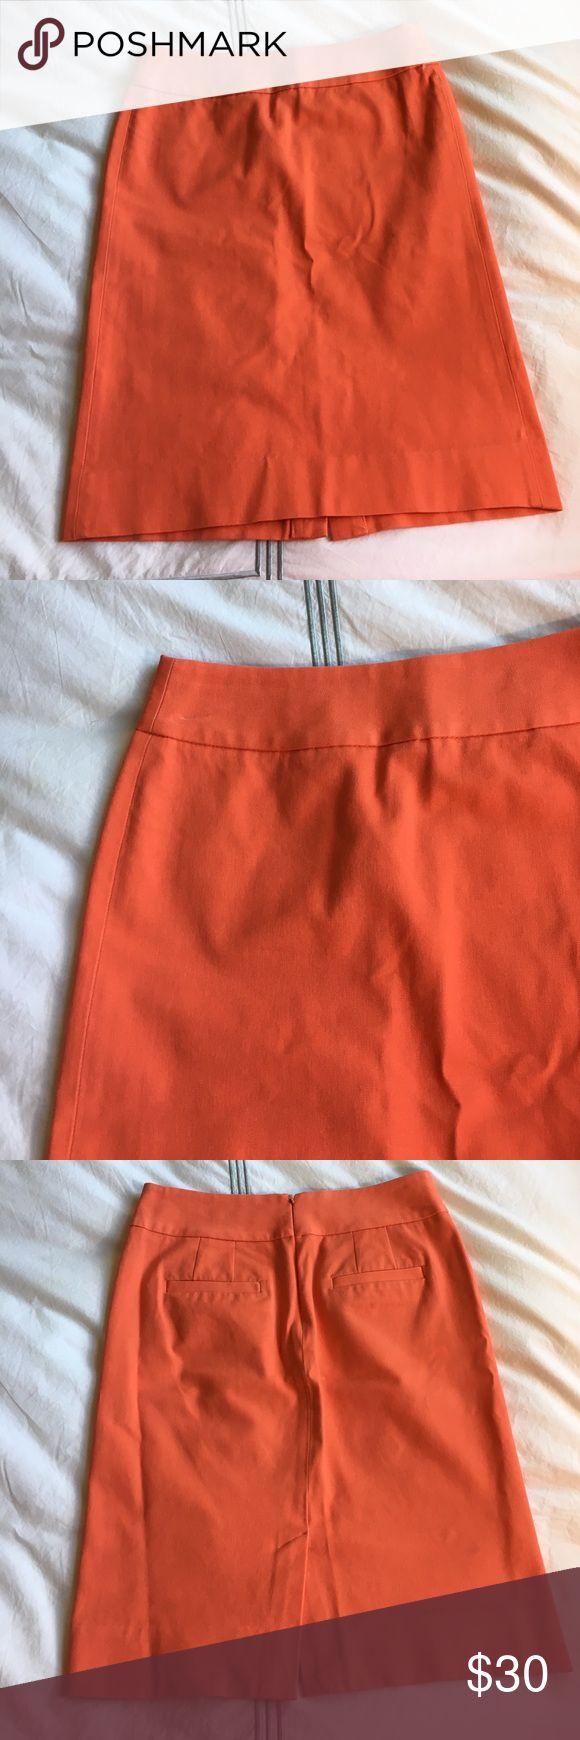 Banana Republic coral pencil skirt A great spring color and super stretchy! EUC. 56% viscose, 39% cotton, 5% spandex. 21 inches long. Banana Republic Skirts Pencil